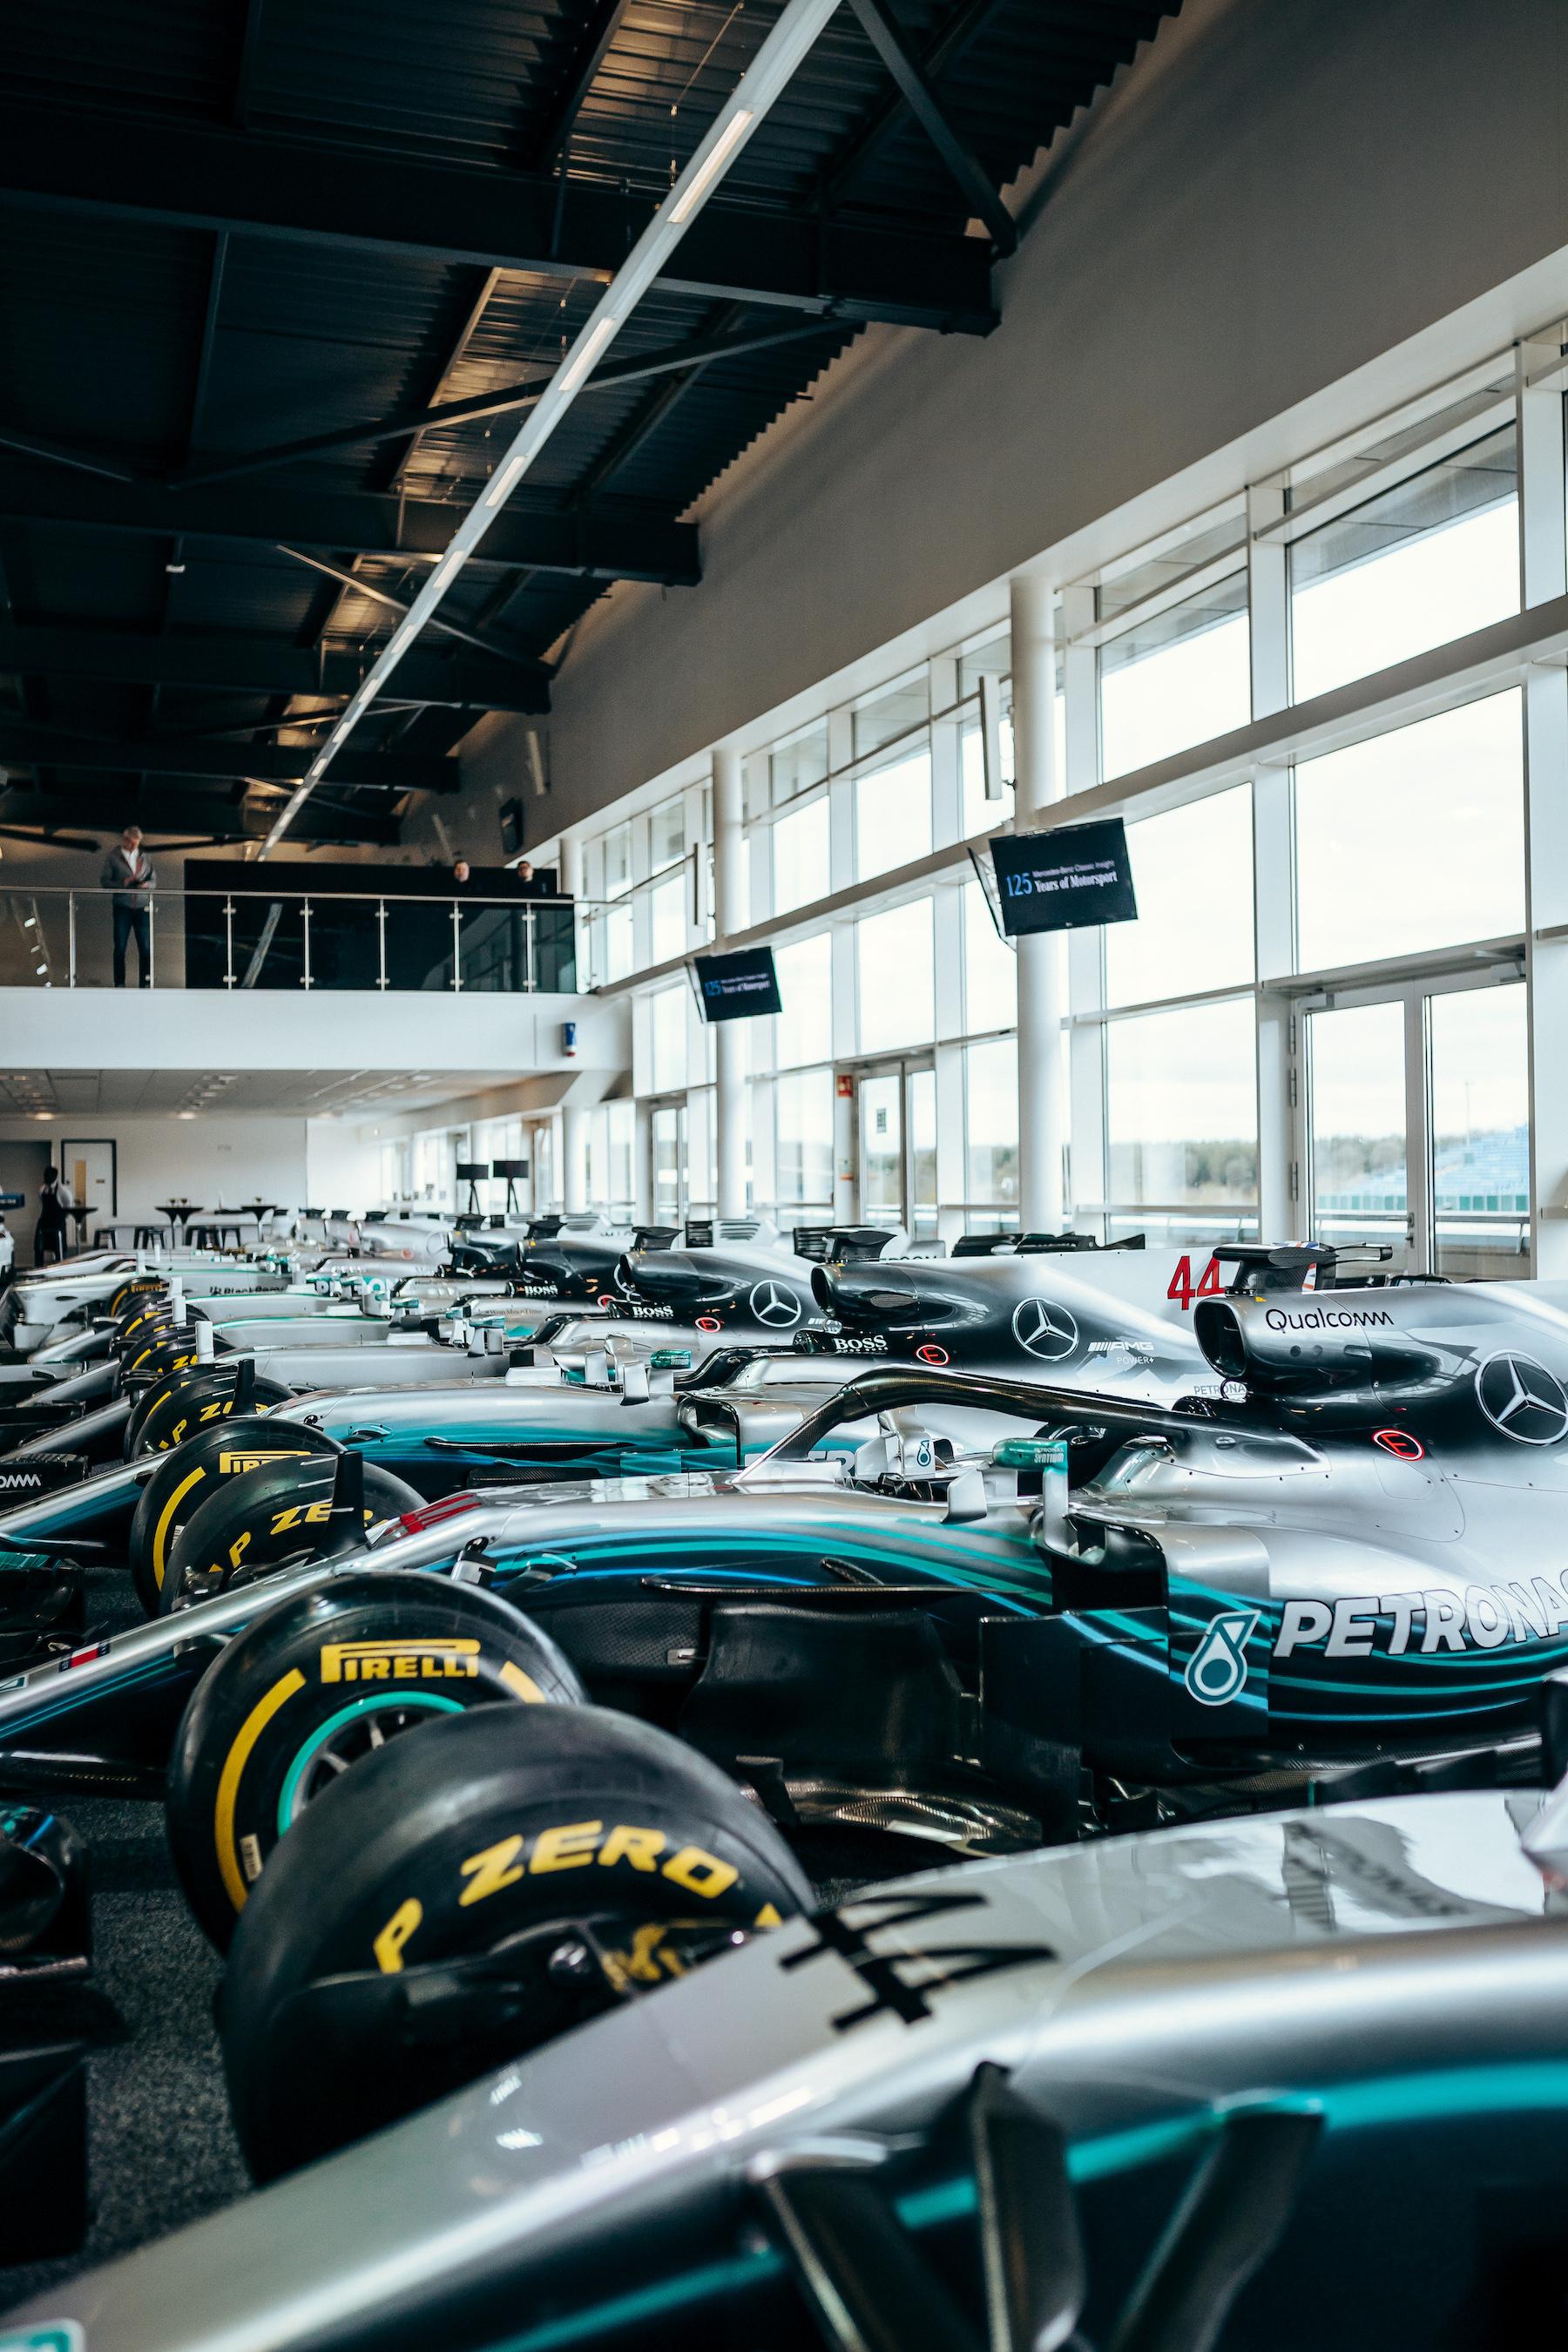 2019 Mercedes 125 years in Motorsports celebration | 2019 Silverstone 3.jpg